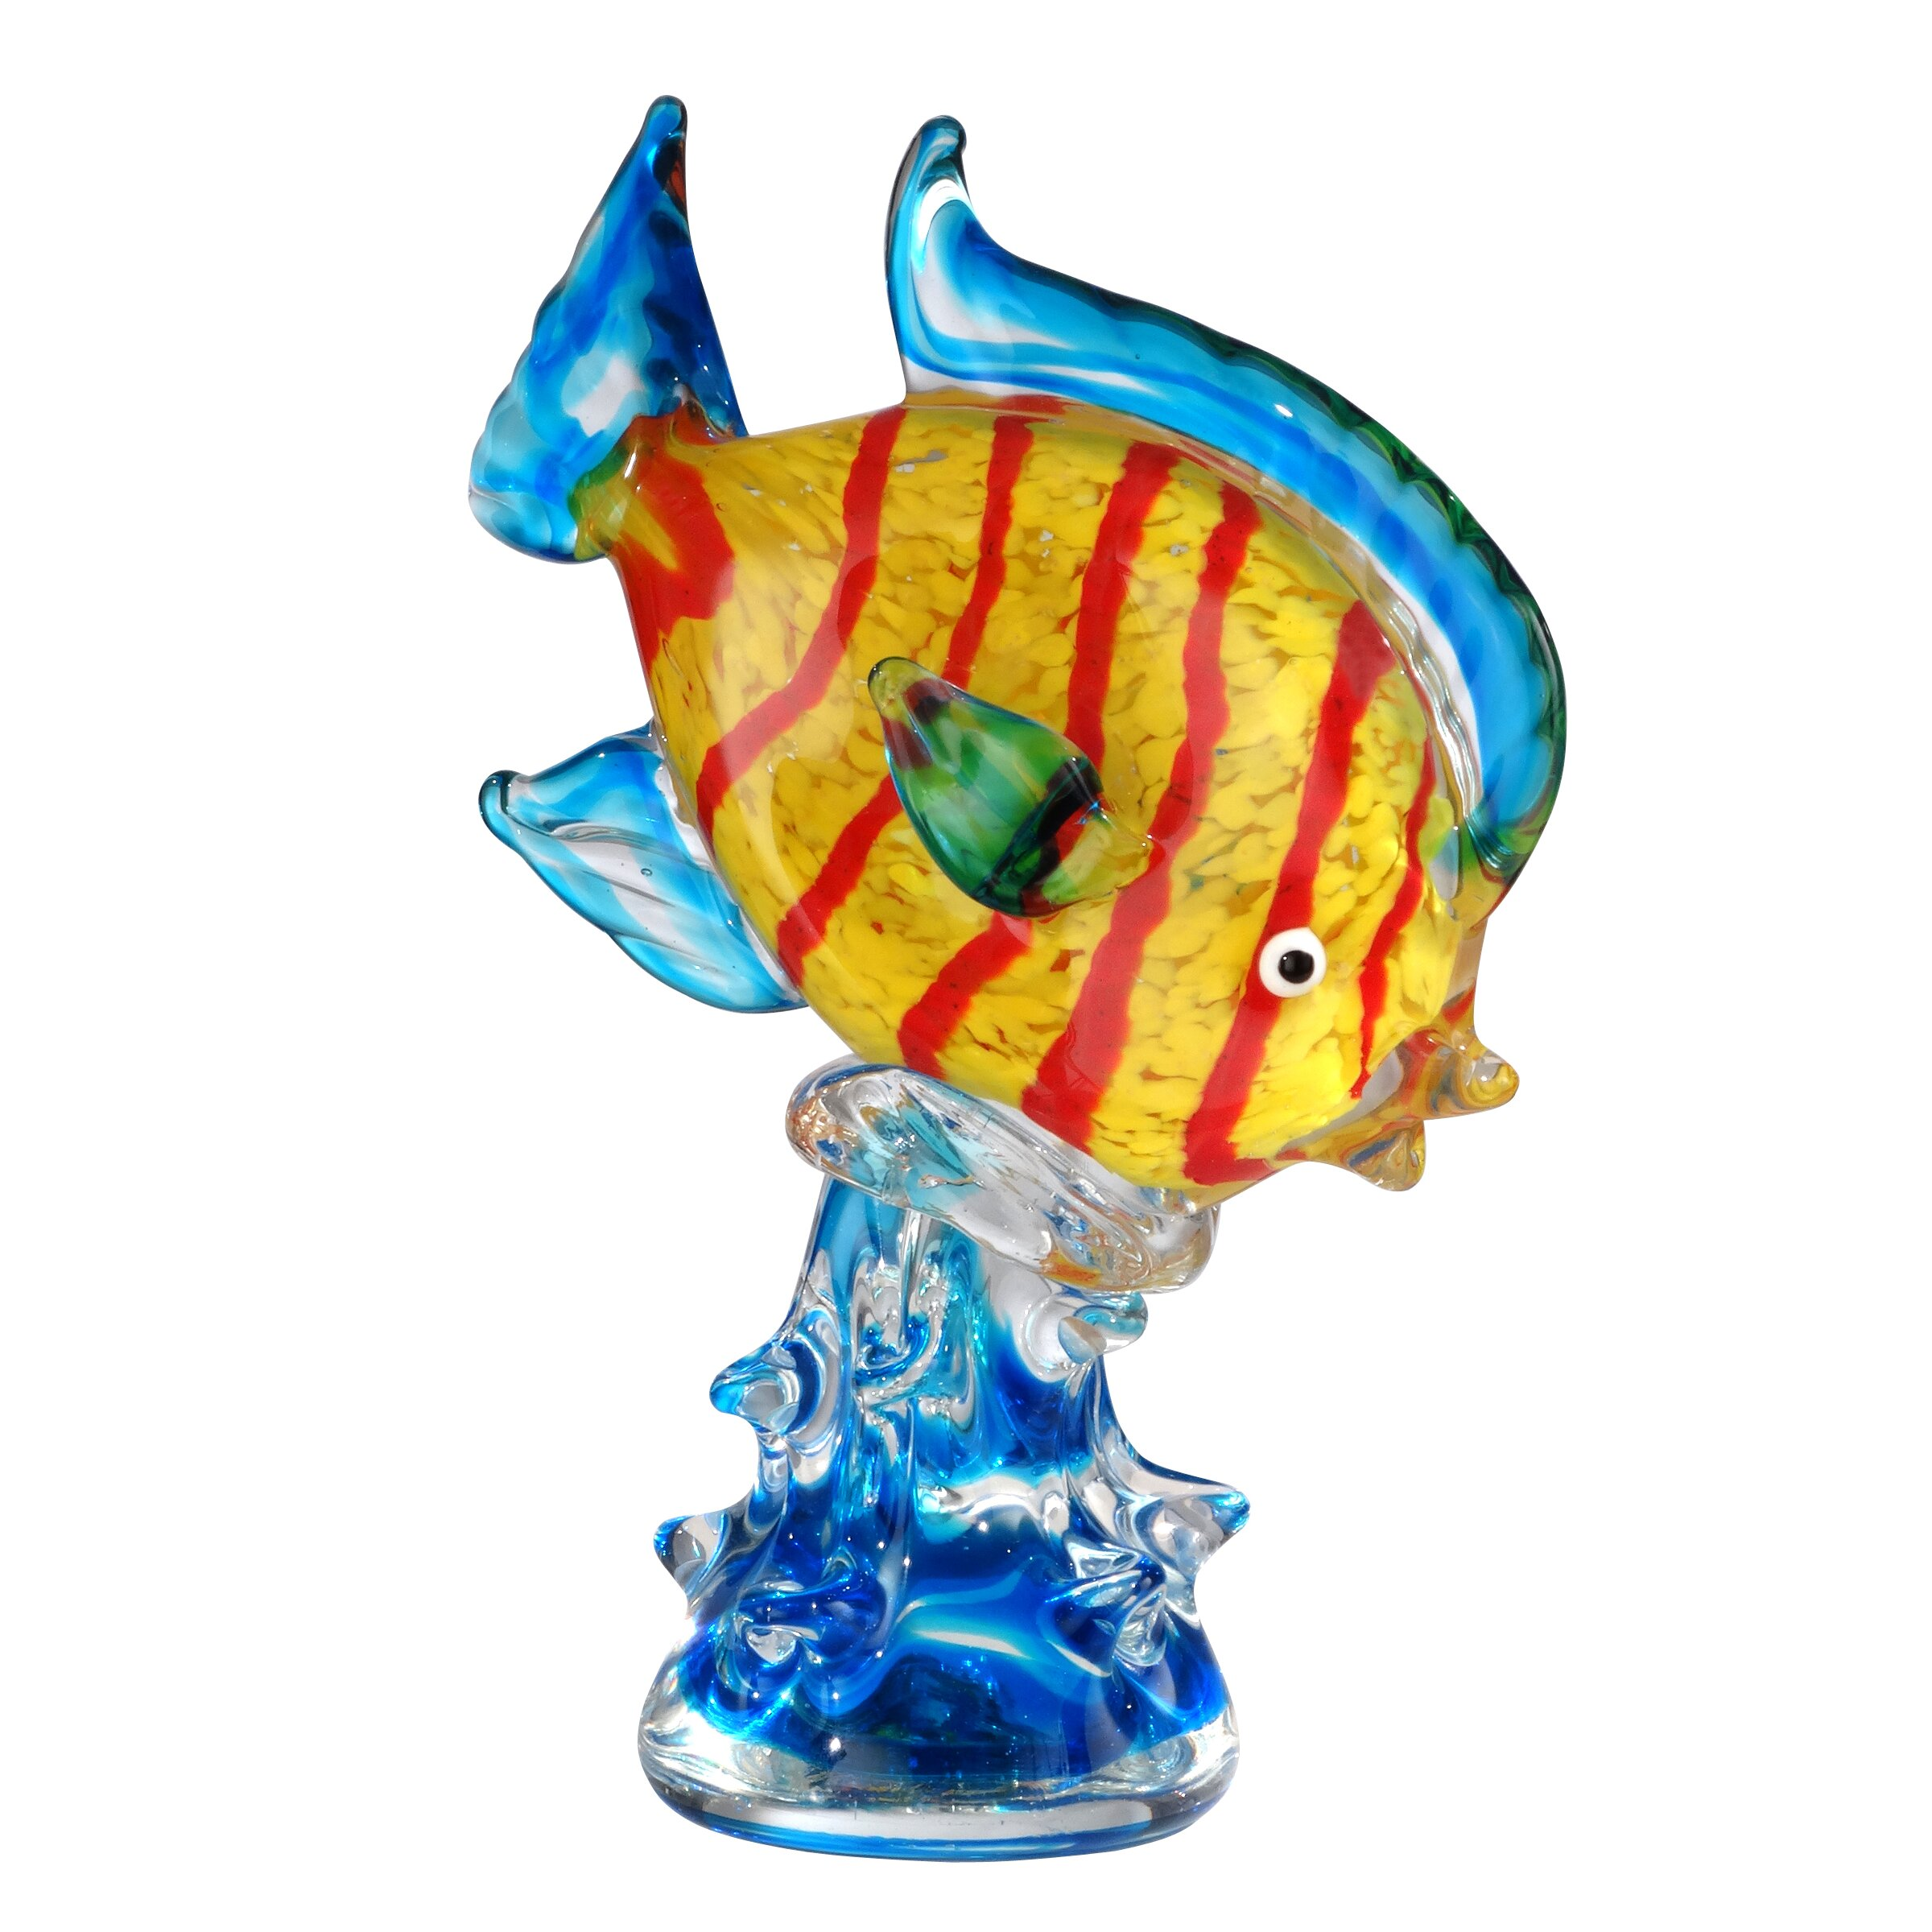 Dale tiffany clown fish figurine wayfair for Clown fish price